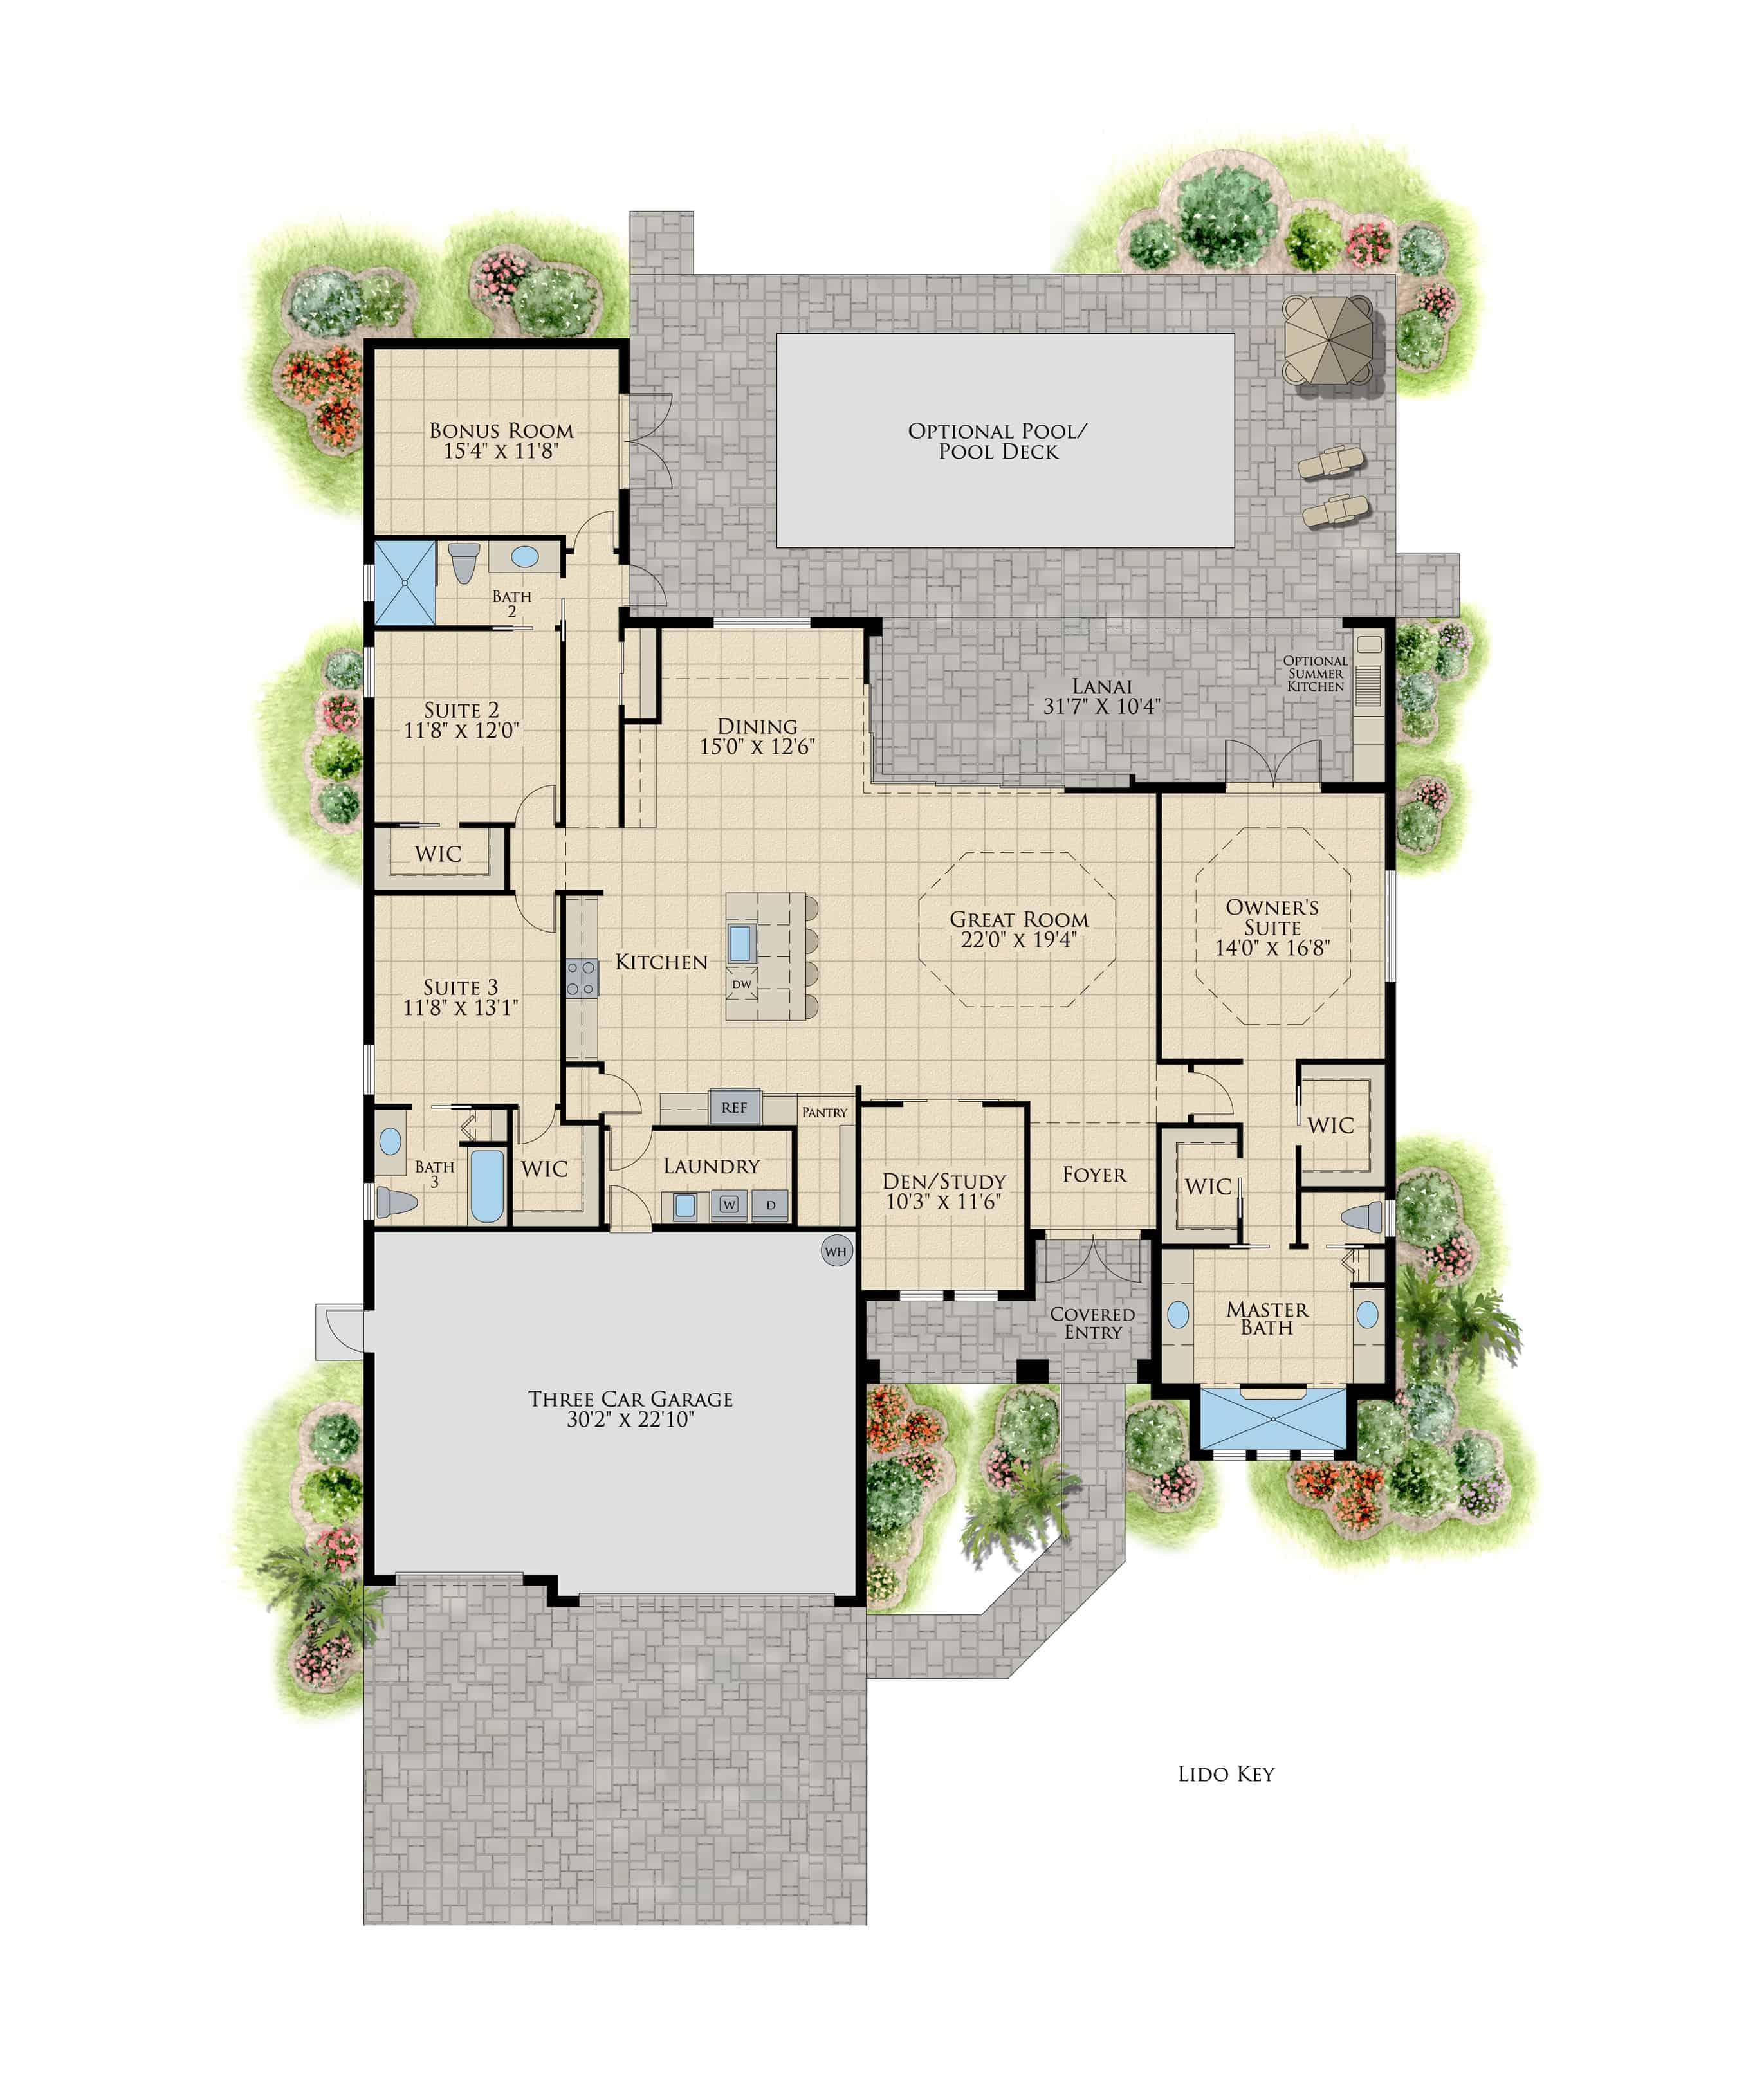 Lido Key Model Floor Plan